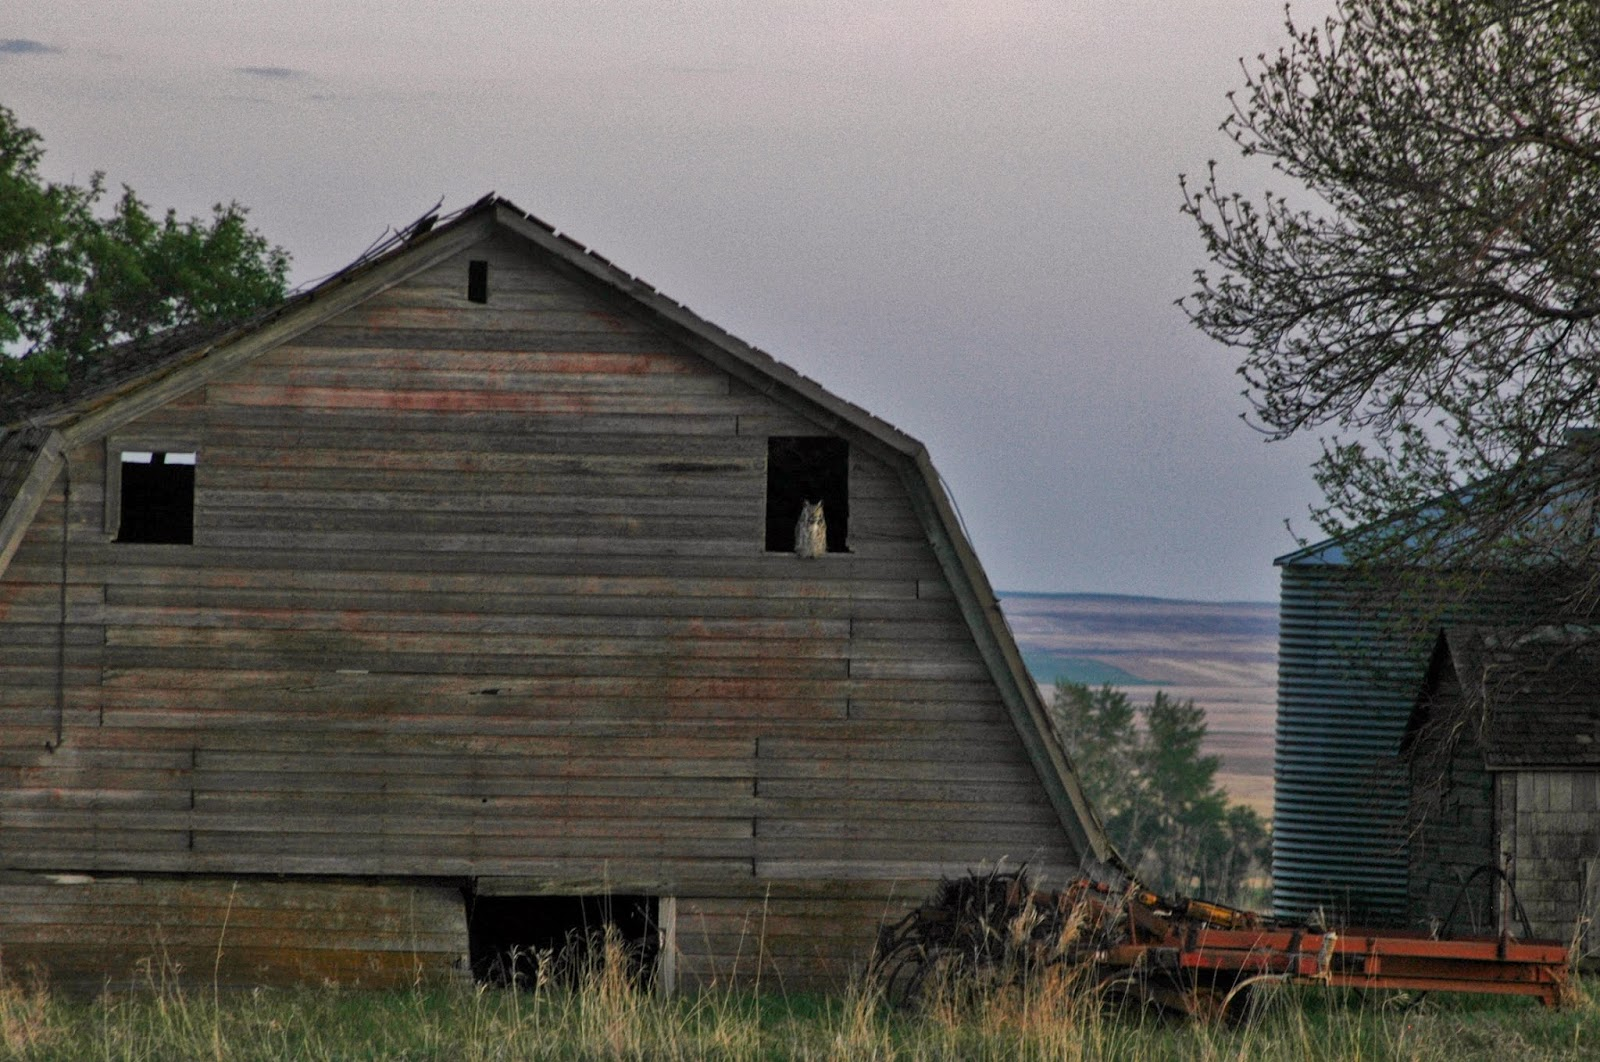 barn owls in a barn - photo #34